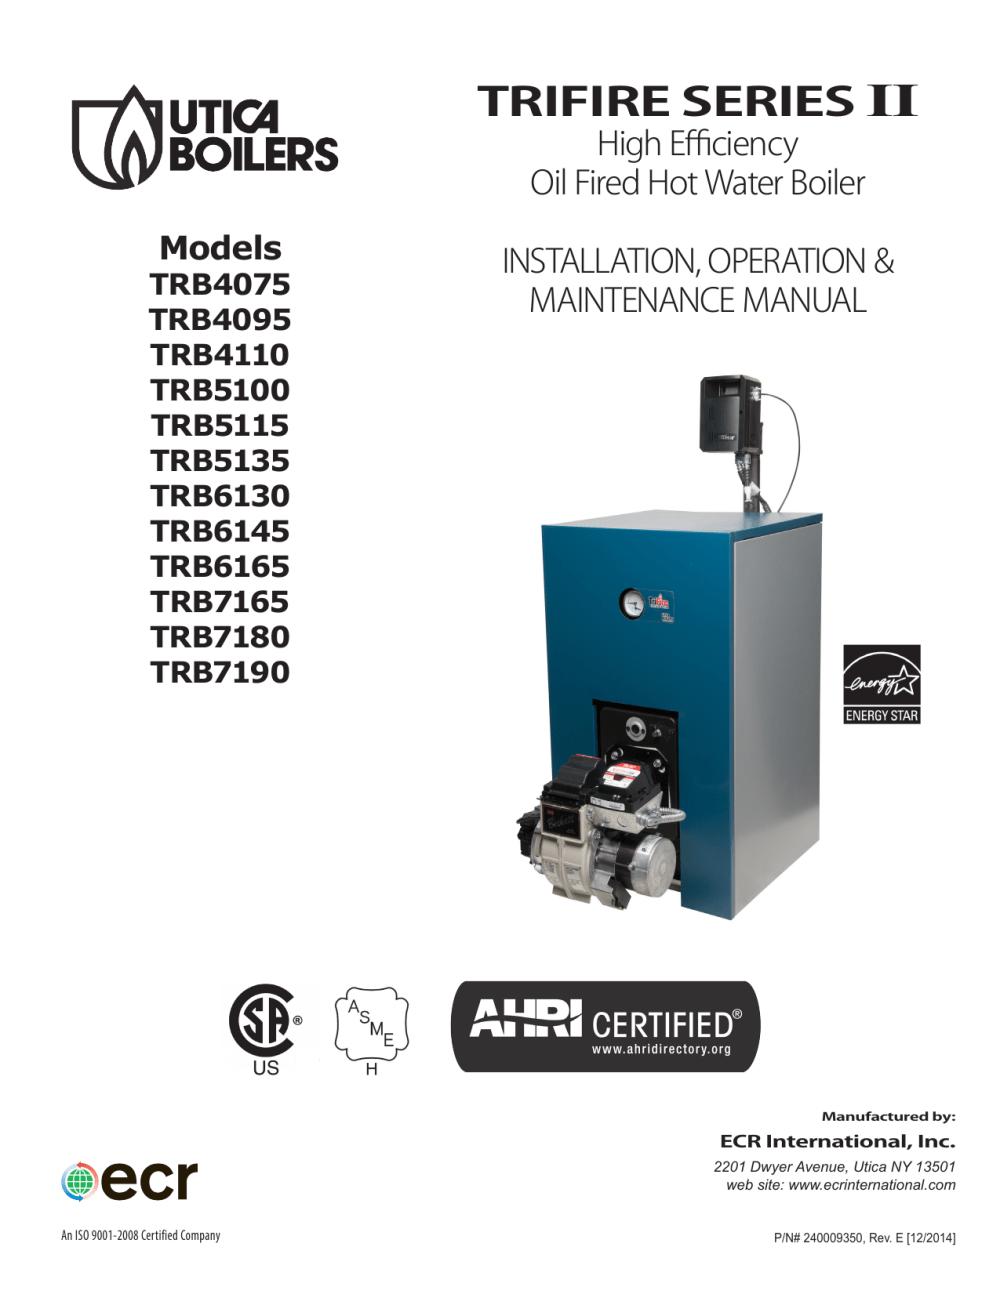 medium resolution of utica boilers trifire trb 3 operation and installation manual manualzz com